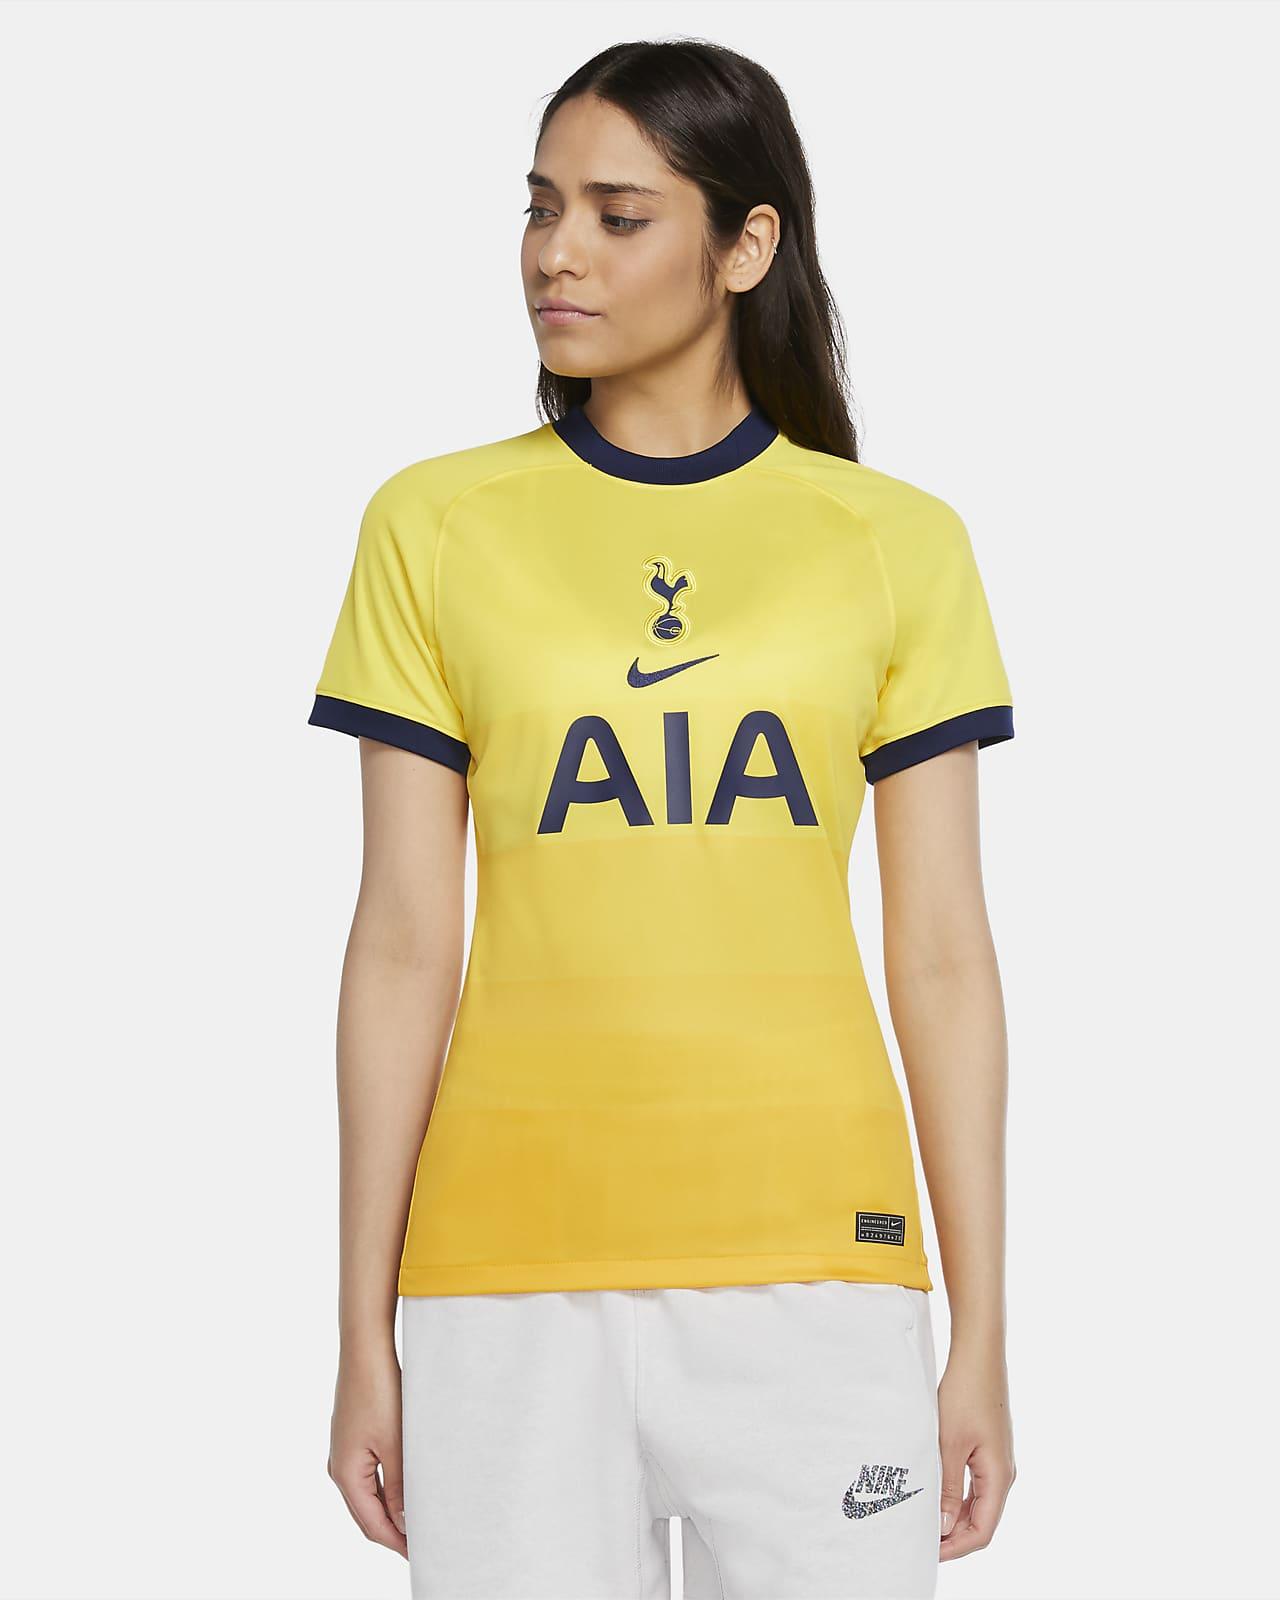 Tottenham Hotspur 2020/21 Stadium Third-fodboldtrøje til kvinder